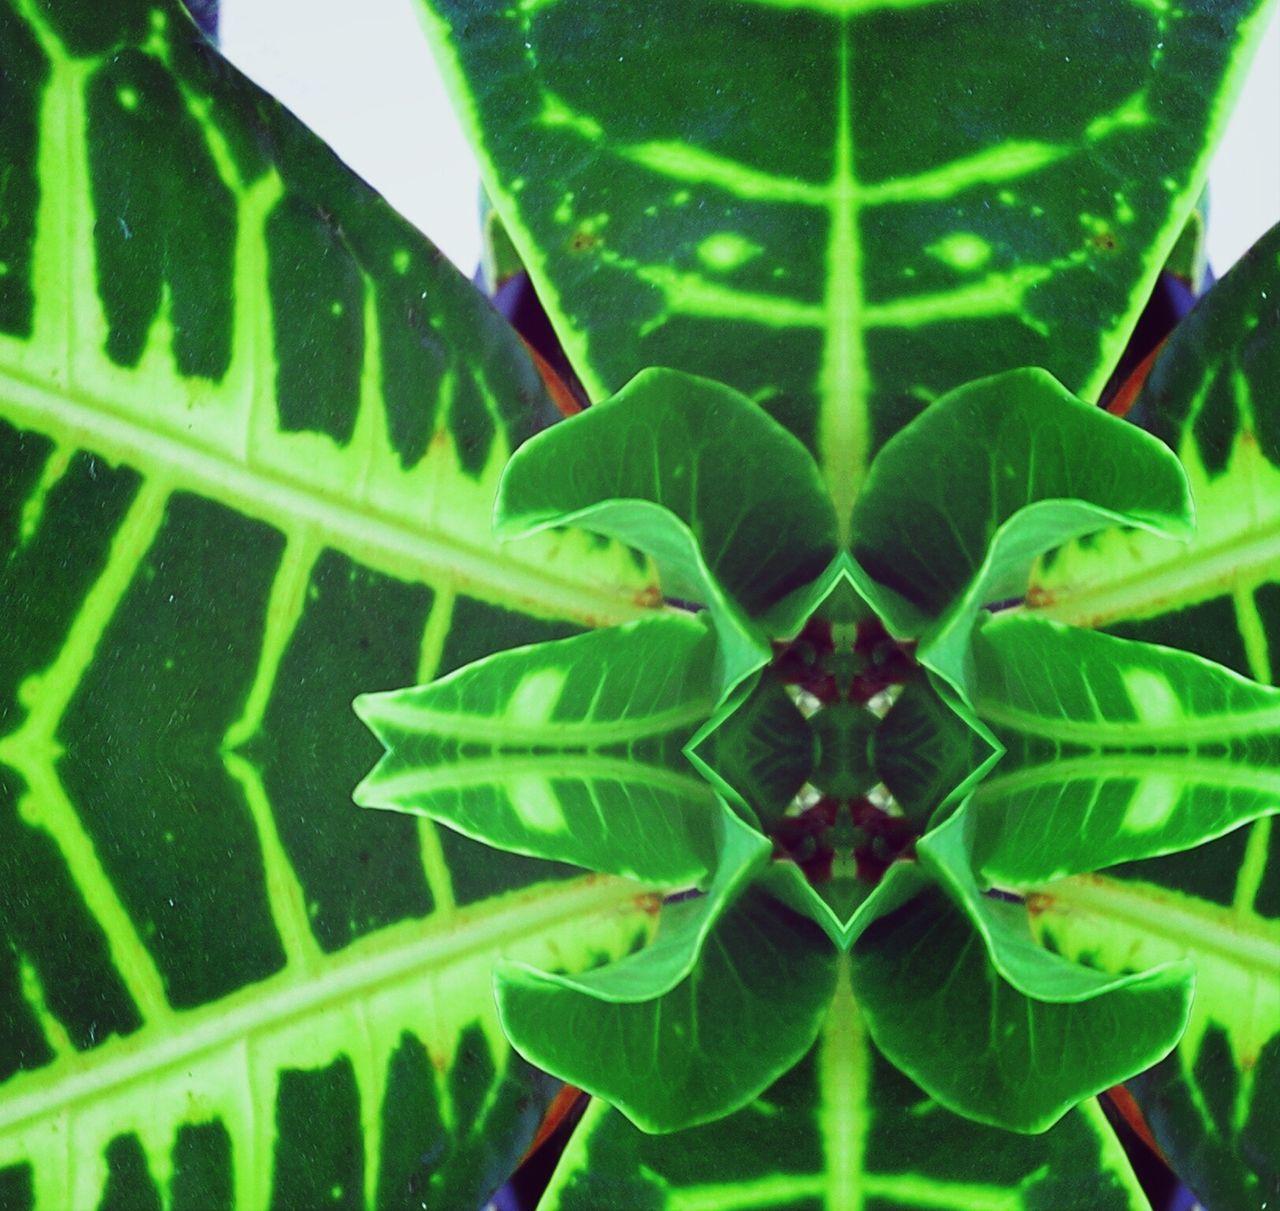 Digital Composite View Of Plant